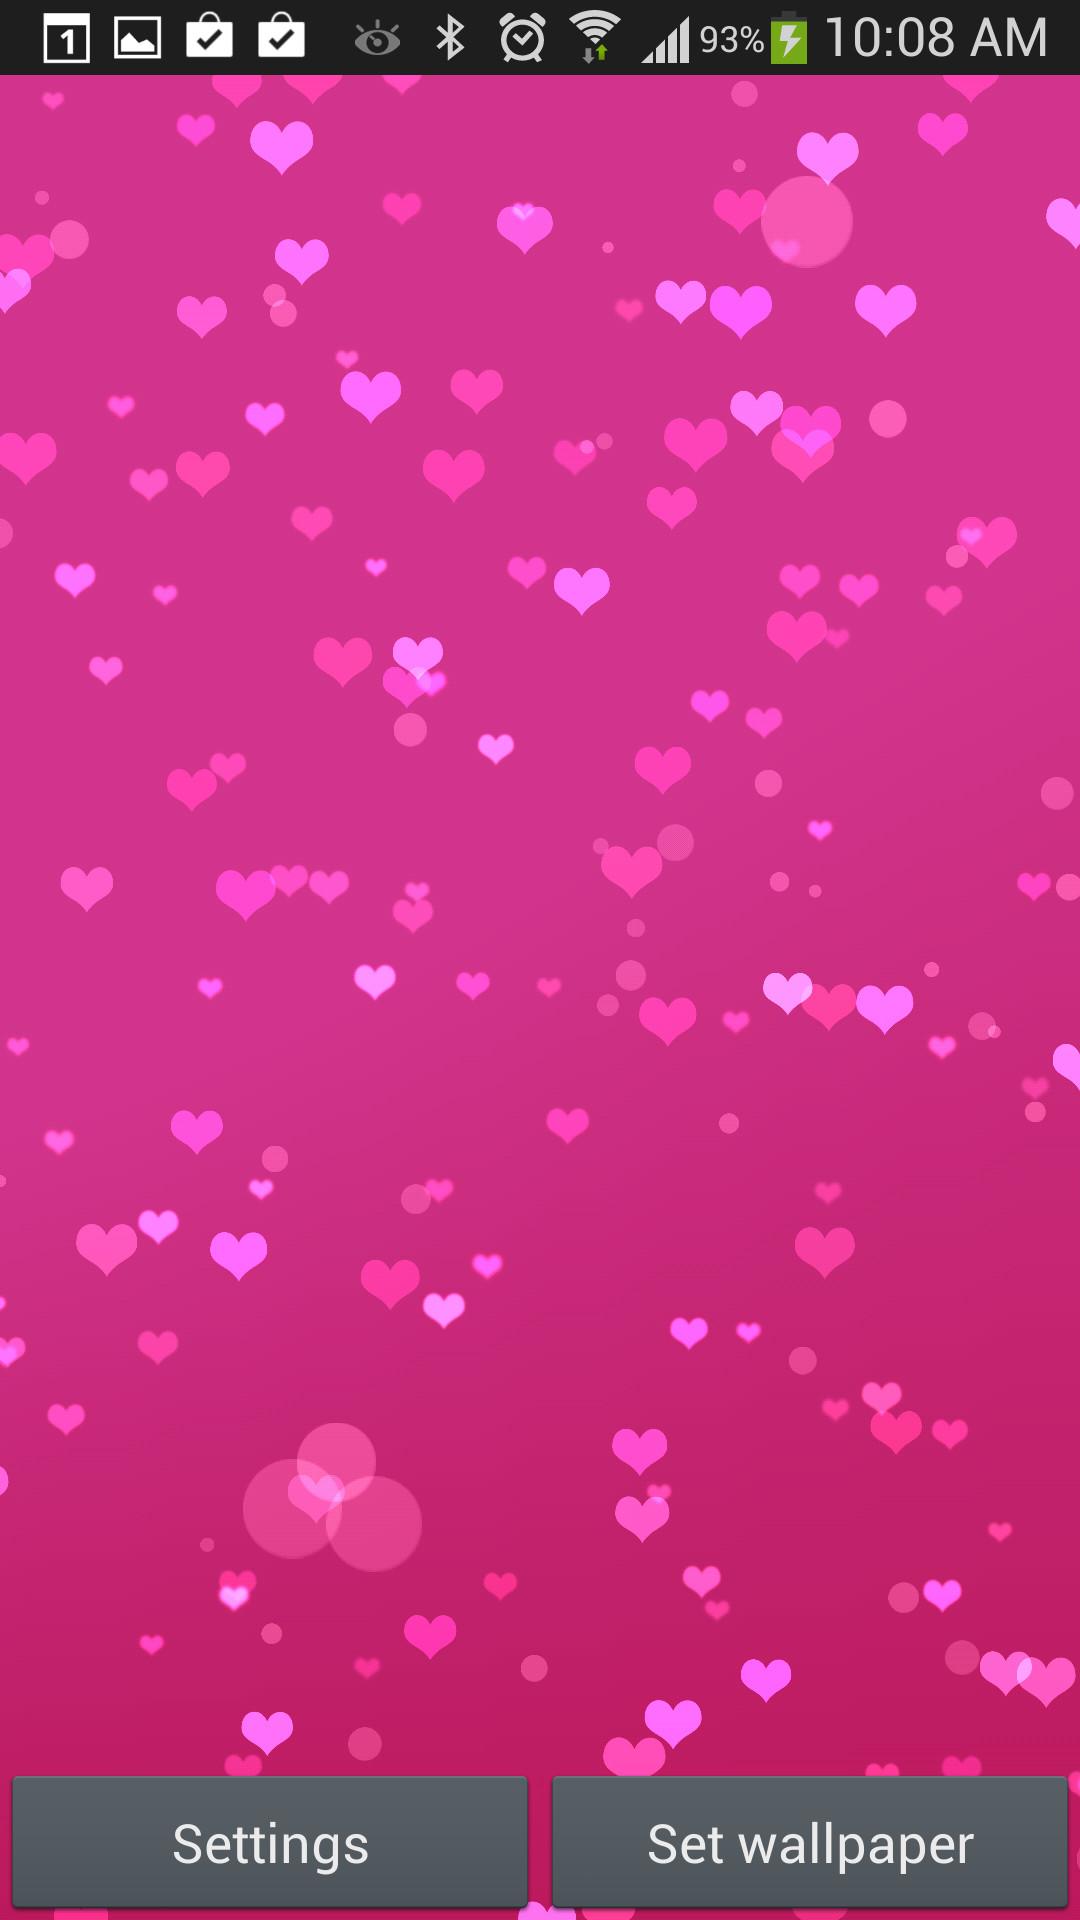 Heart Live Wallpaper 2 – AndroidTapp